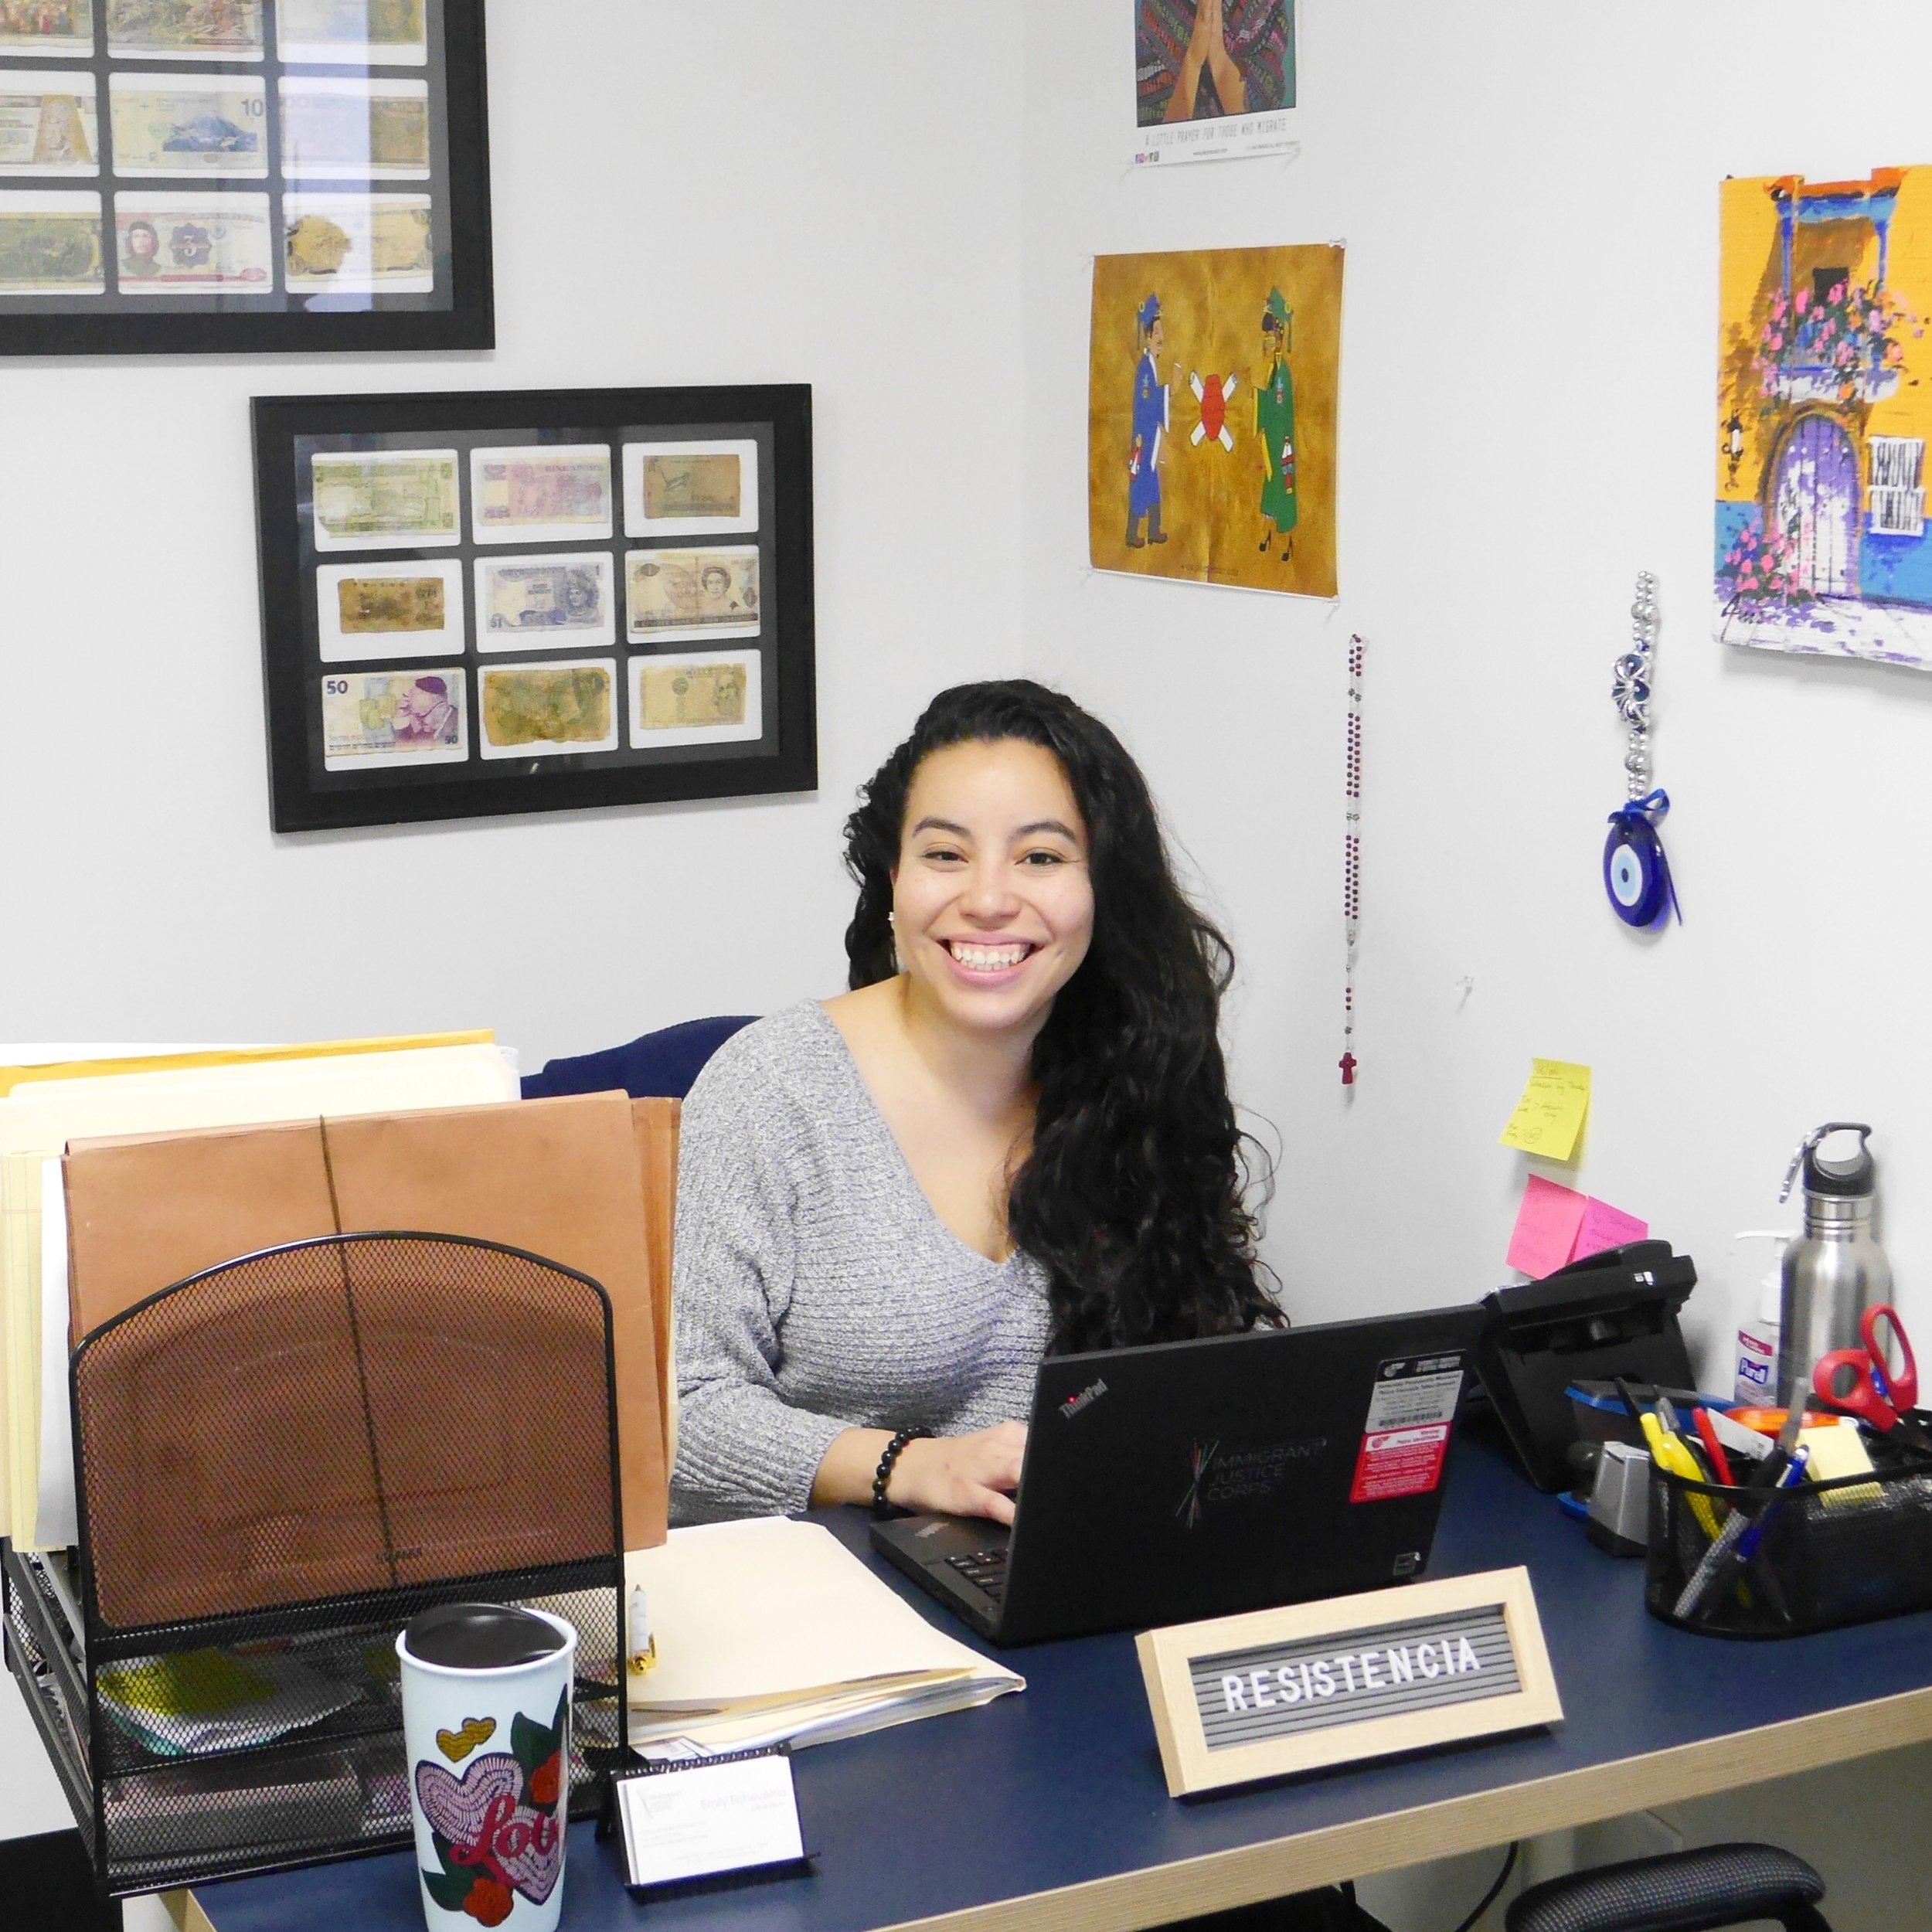 Justice Fellow Emily Echeverria